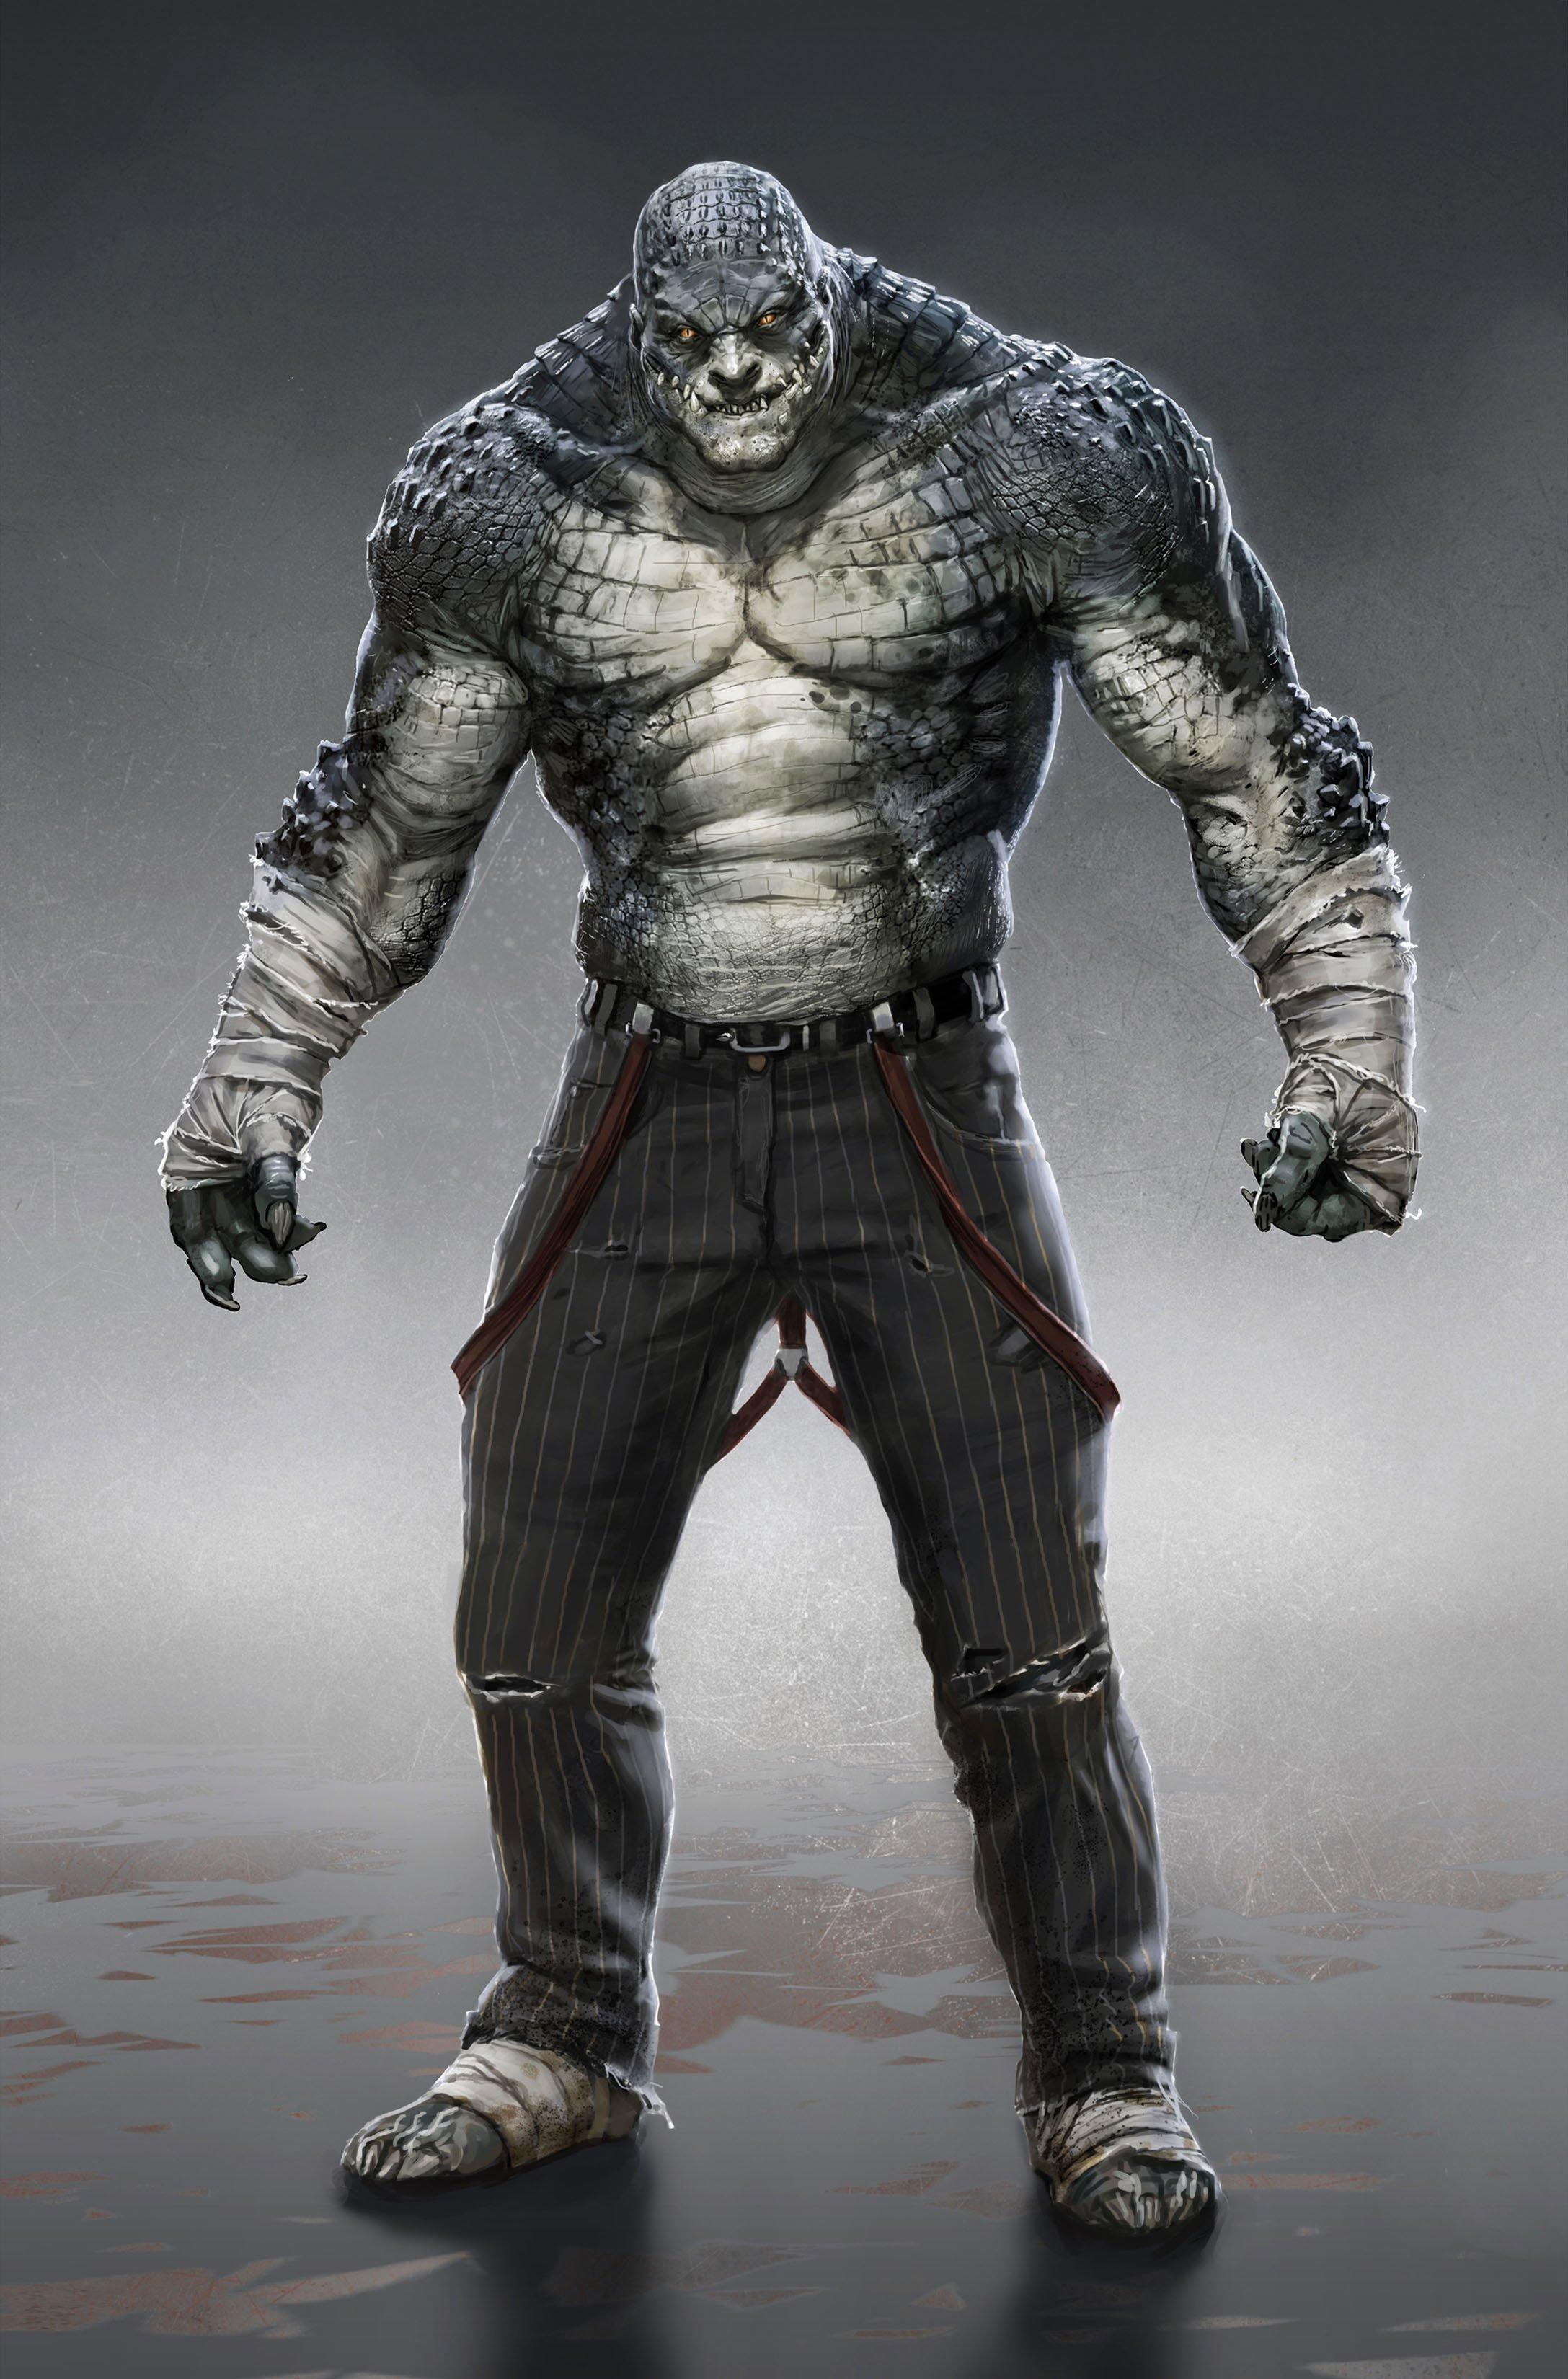 http://www.lightninggamingnews.com/wp-content/uploads/2013/12/Batman-Arkham-Origins-Exclusive-Killer-Croc-Deathstroke-Concept-Art-1.jpg